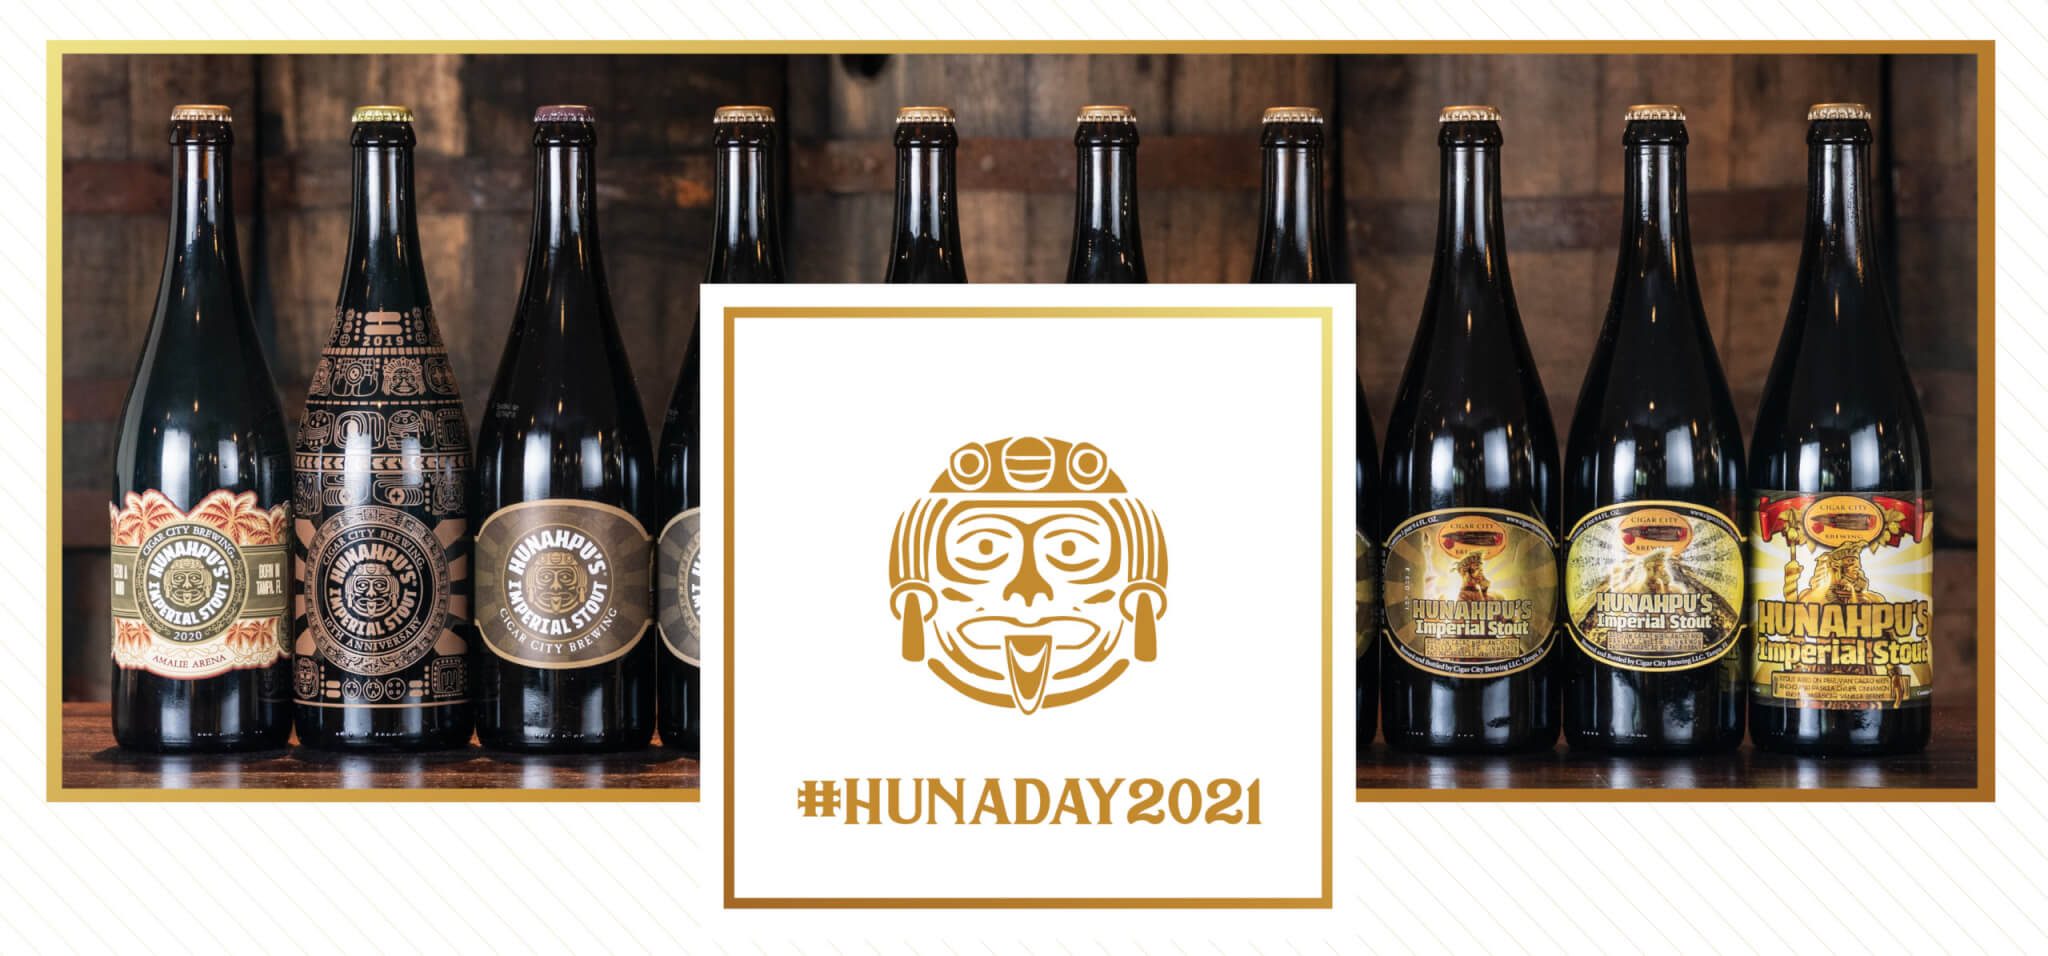 Hunahpu 2021 Banner